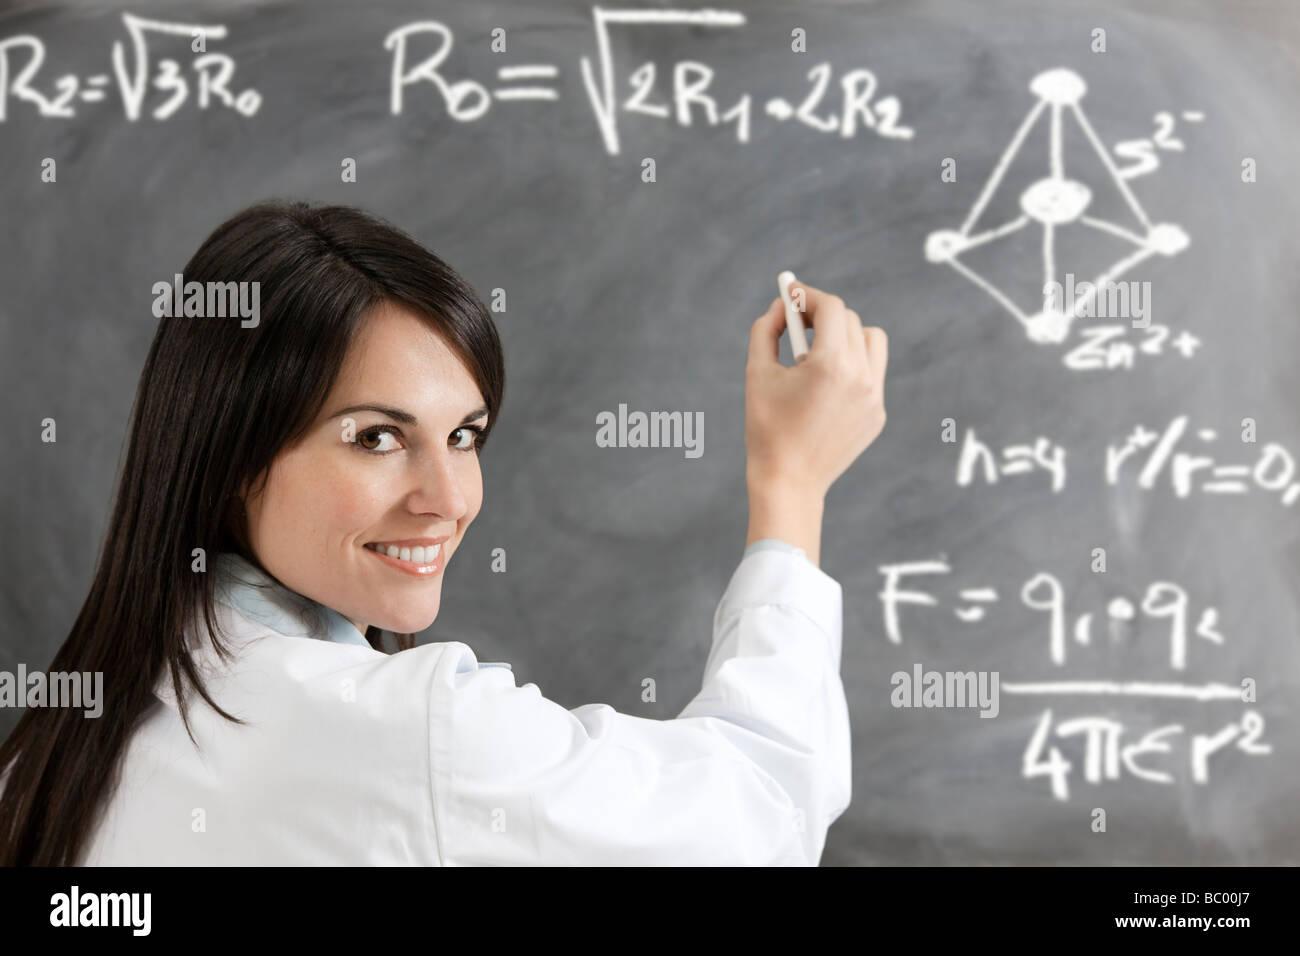 female teacher formulas writing on blackboard - Stock Image